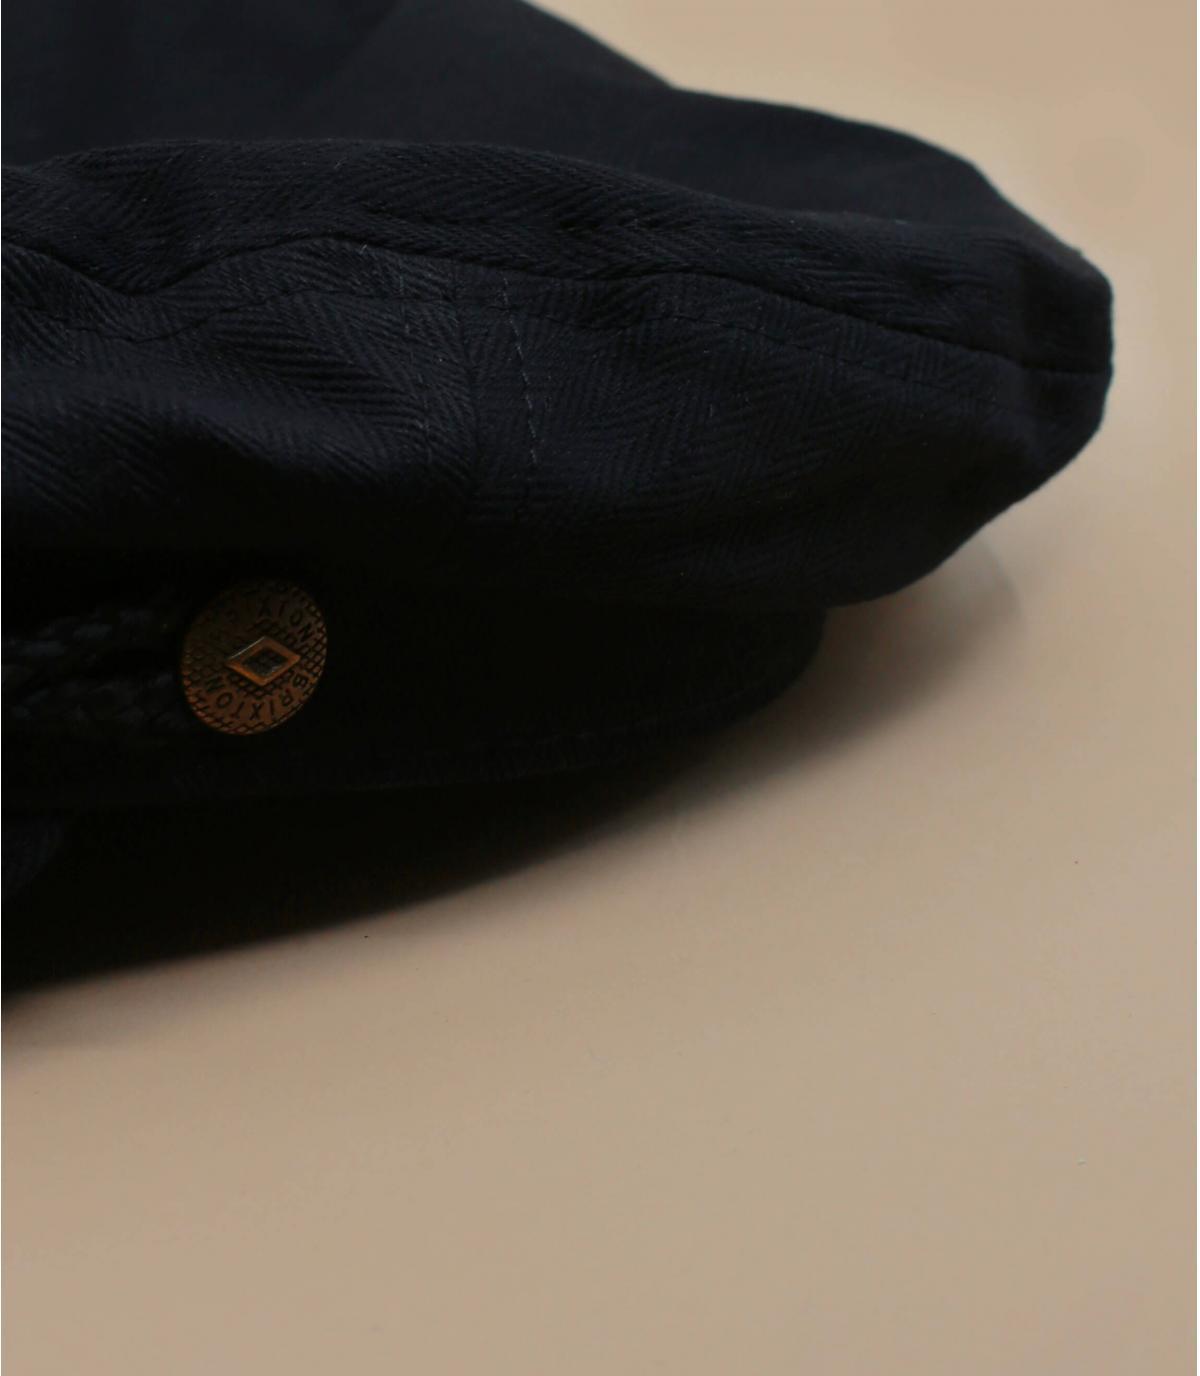 Dettagli Fiddler black herringbone - image 3